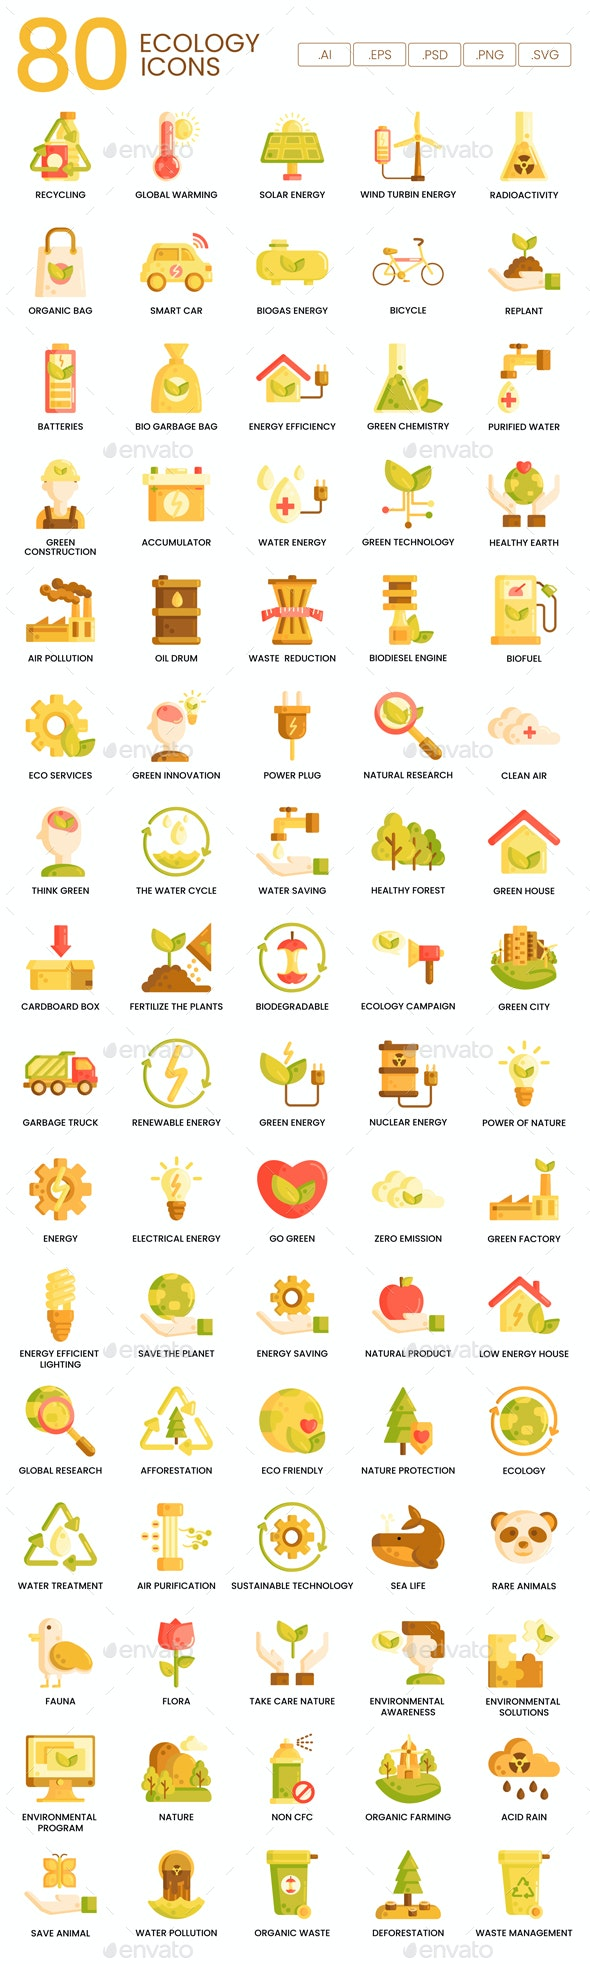 Ecology Icons - Caramel Series